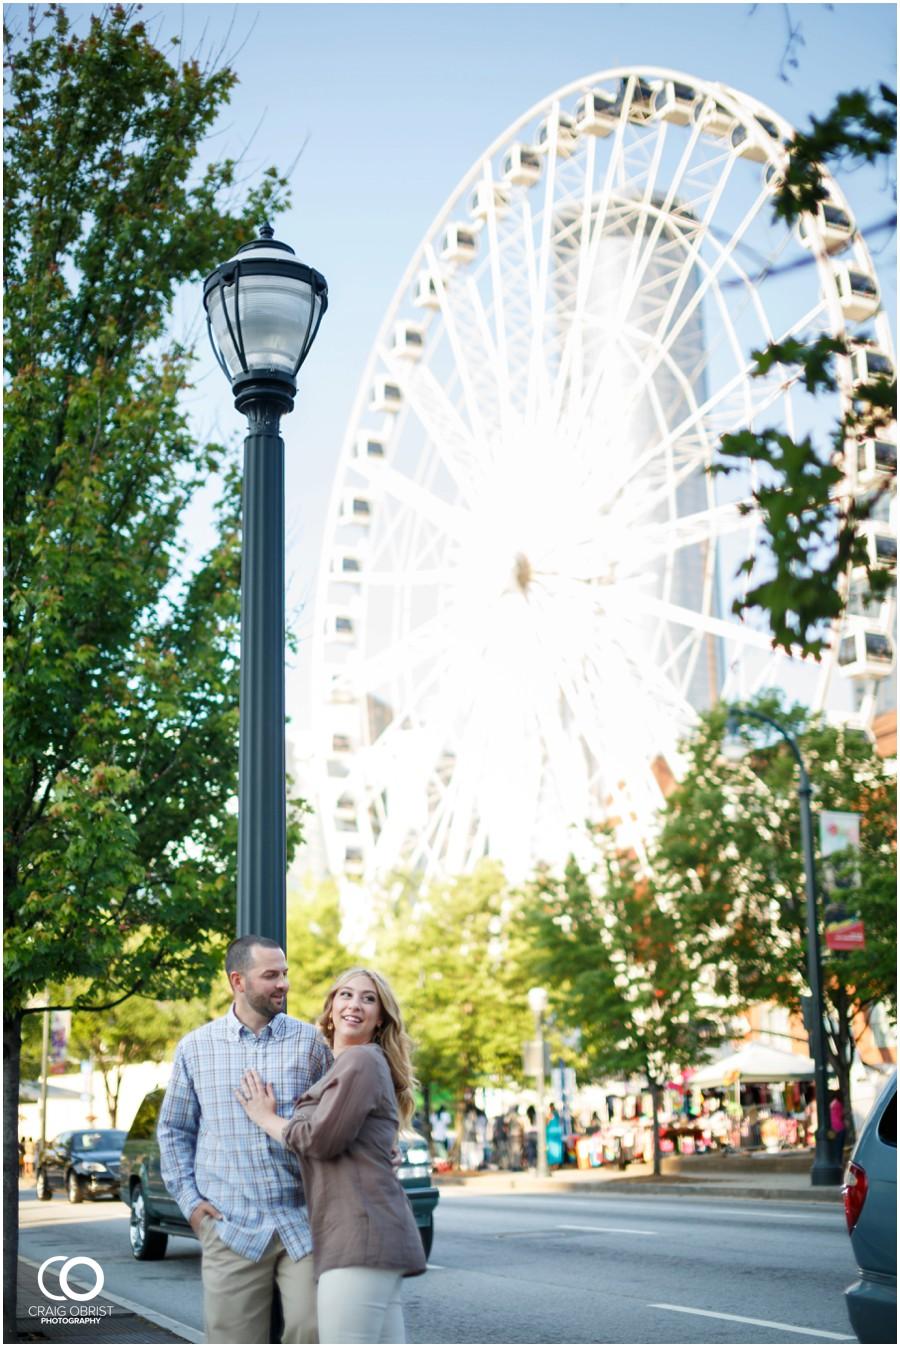 Philips-Arena-Atlanta-Buckhead-City-Engagement-Portraits_0005.jpg